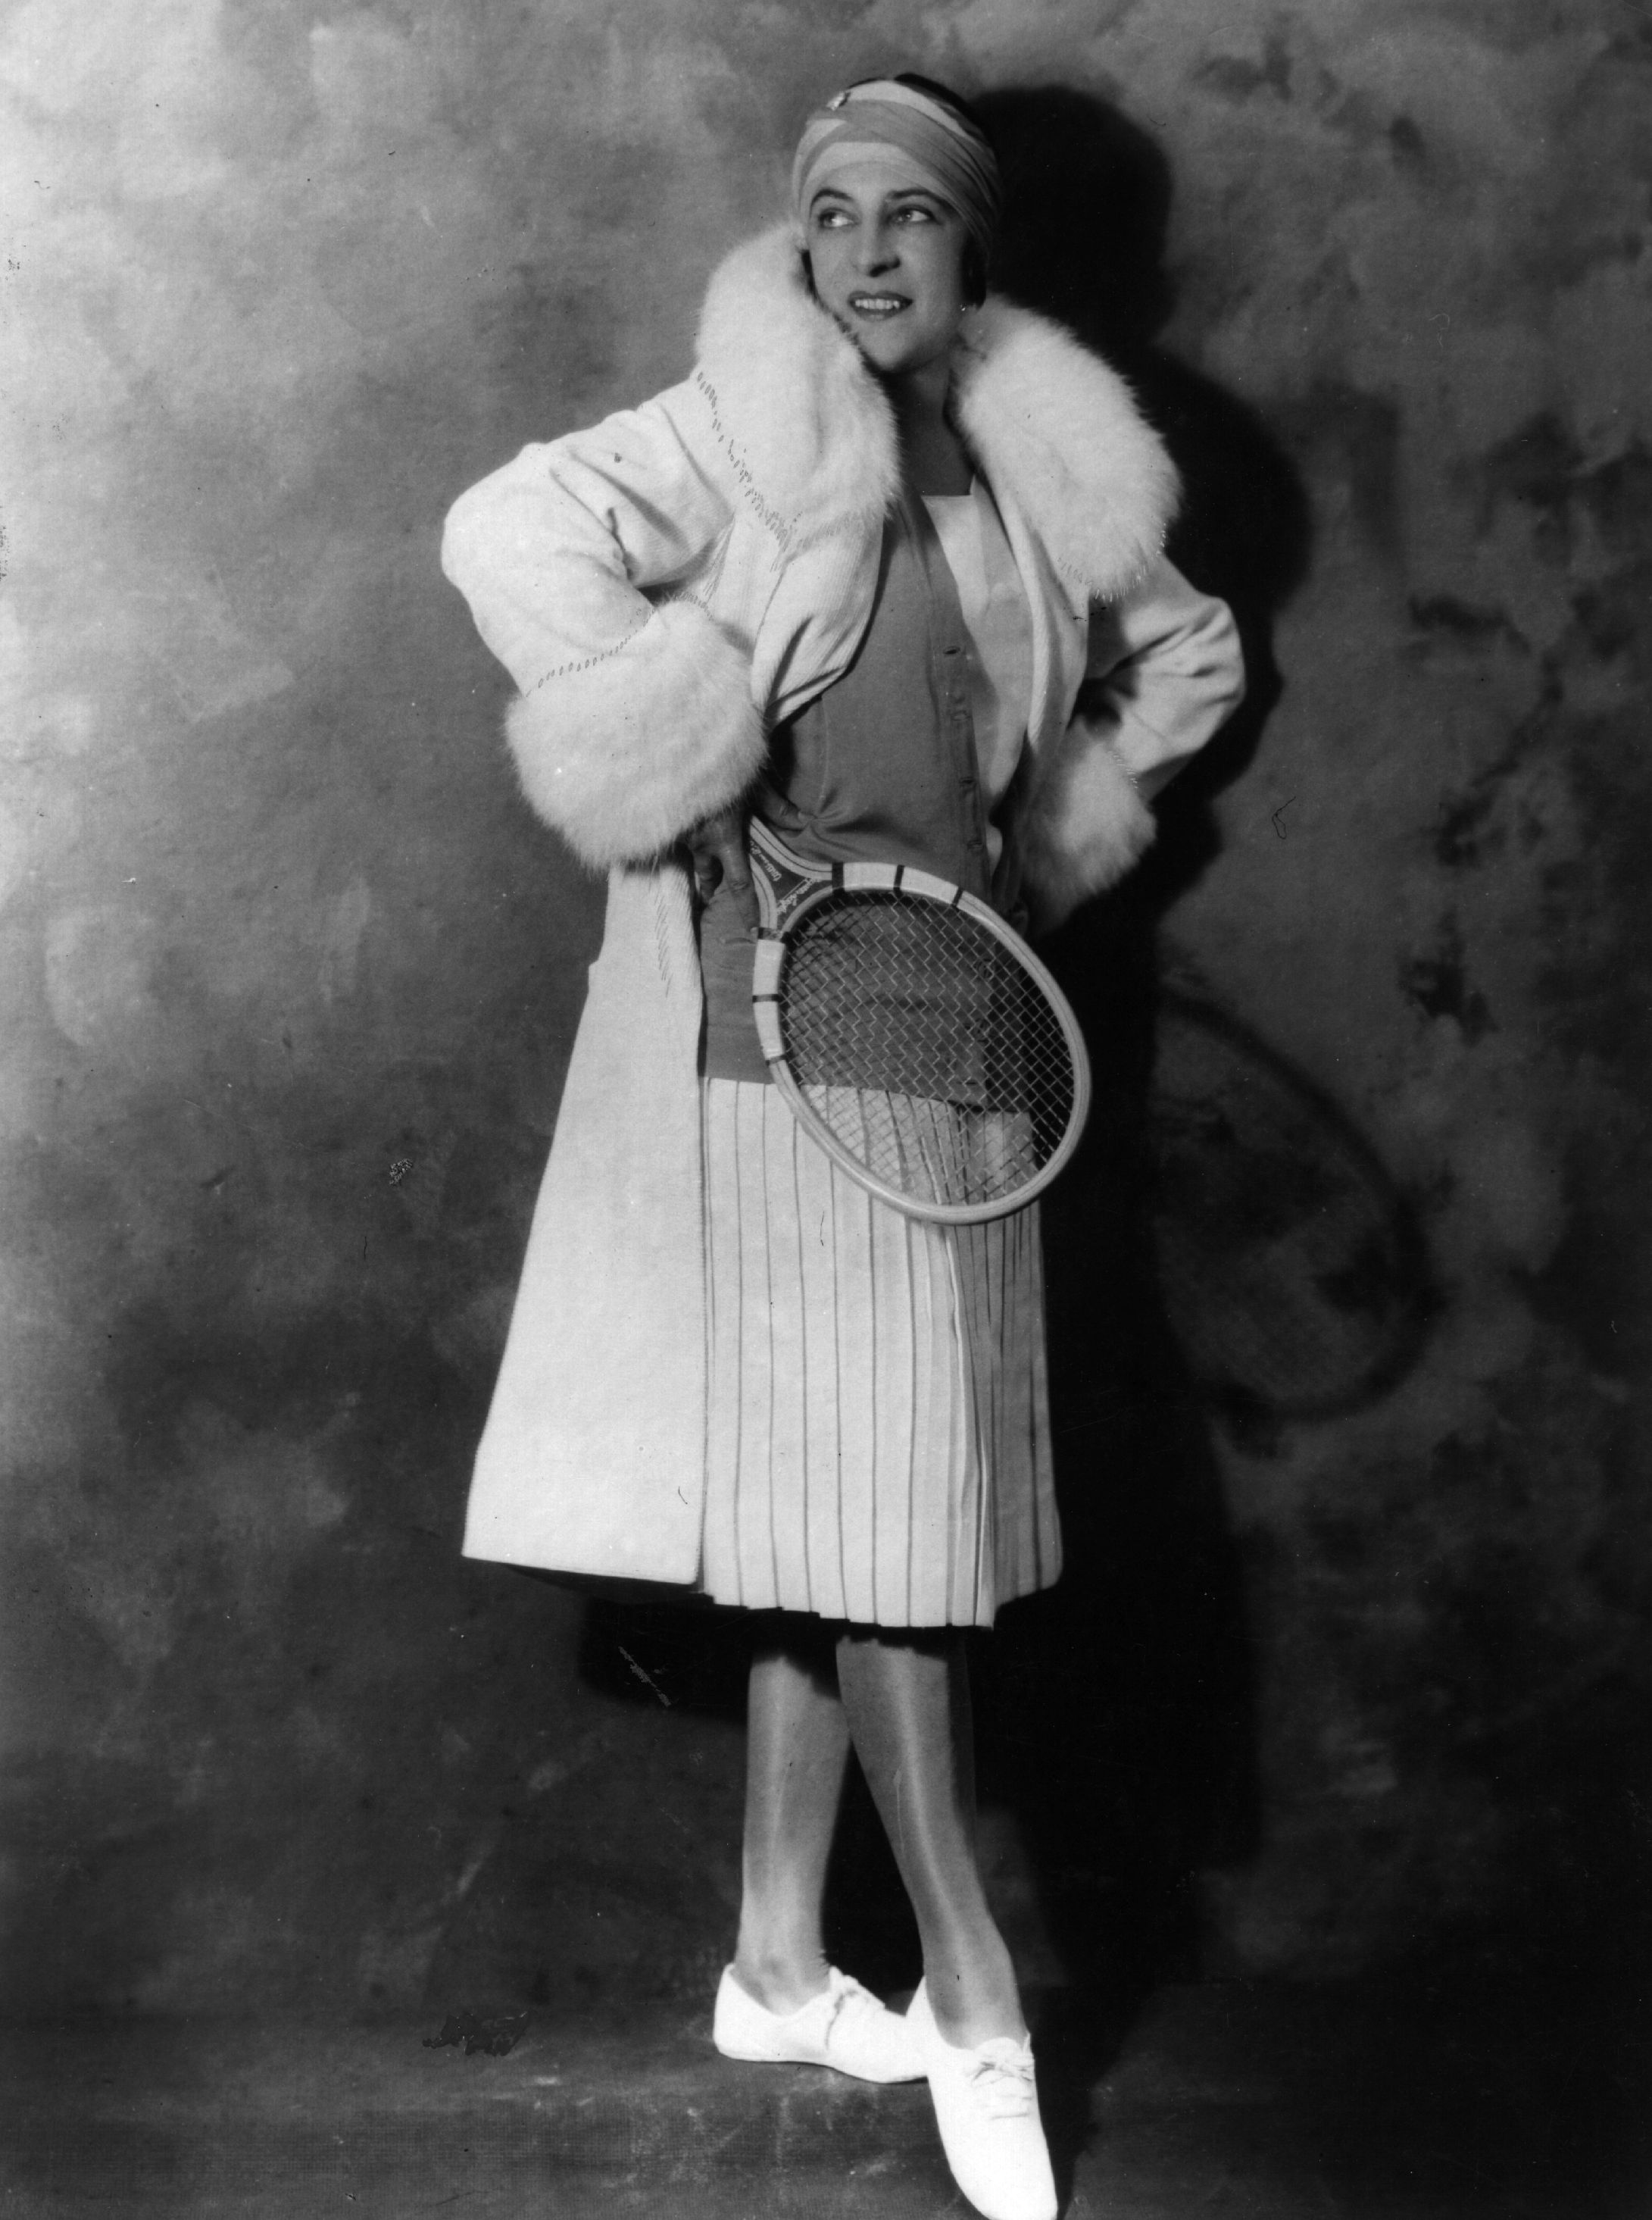 suzanne lenglen, suzanne lenglens 117th birthday